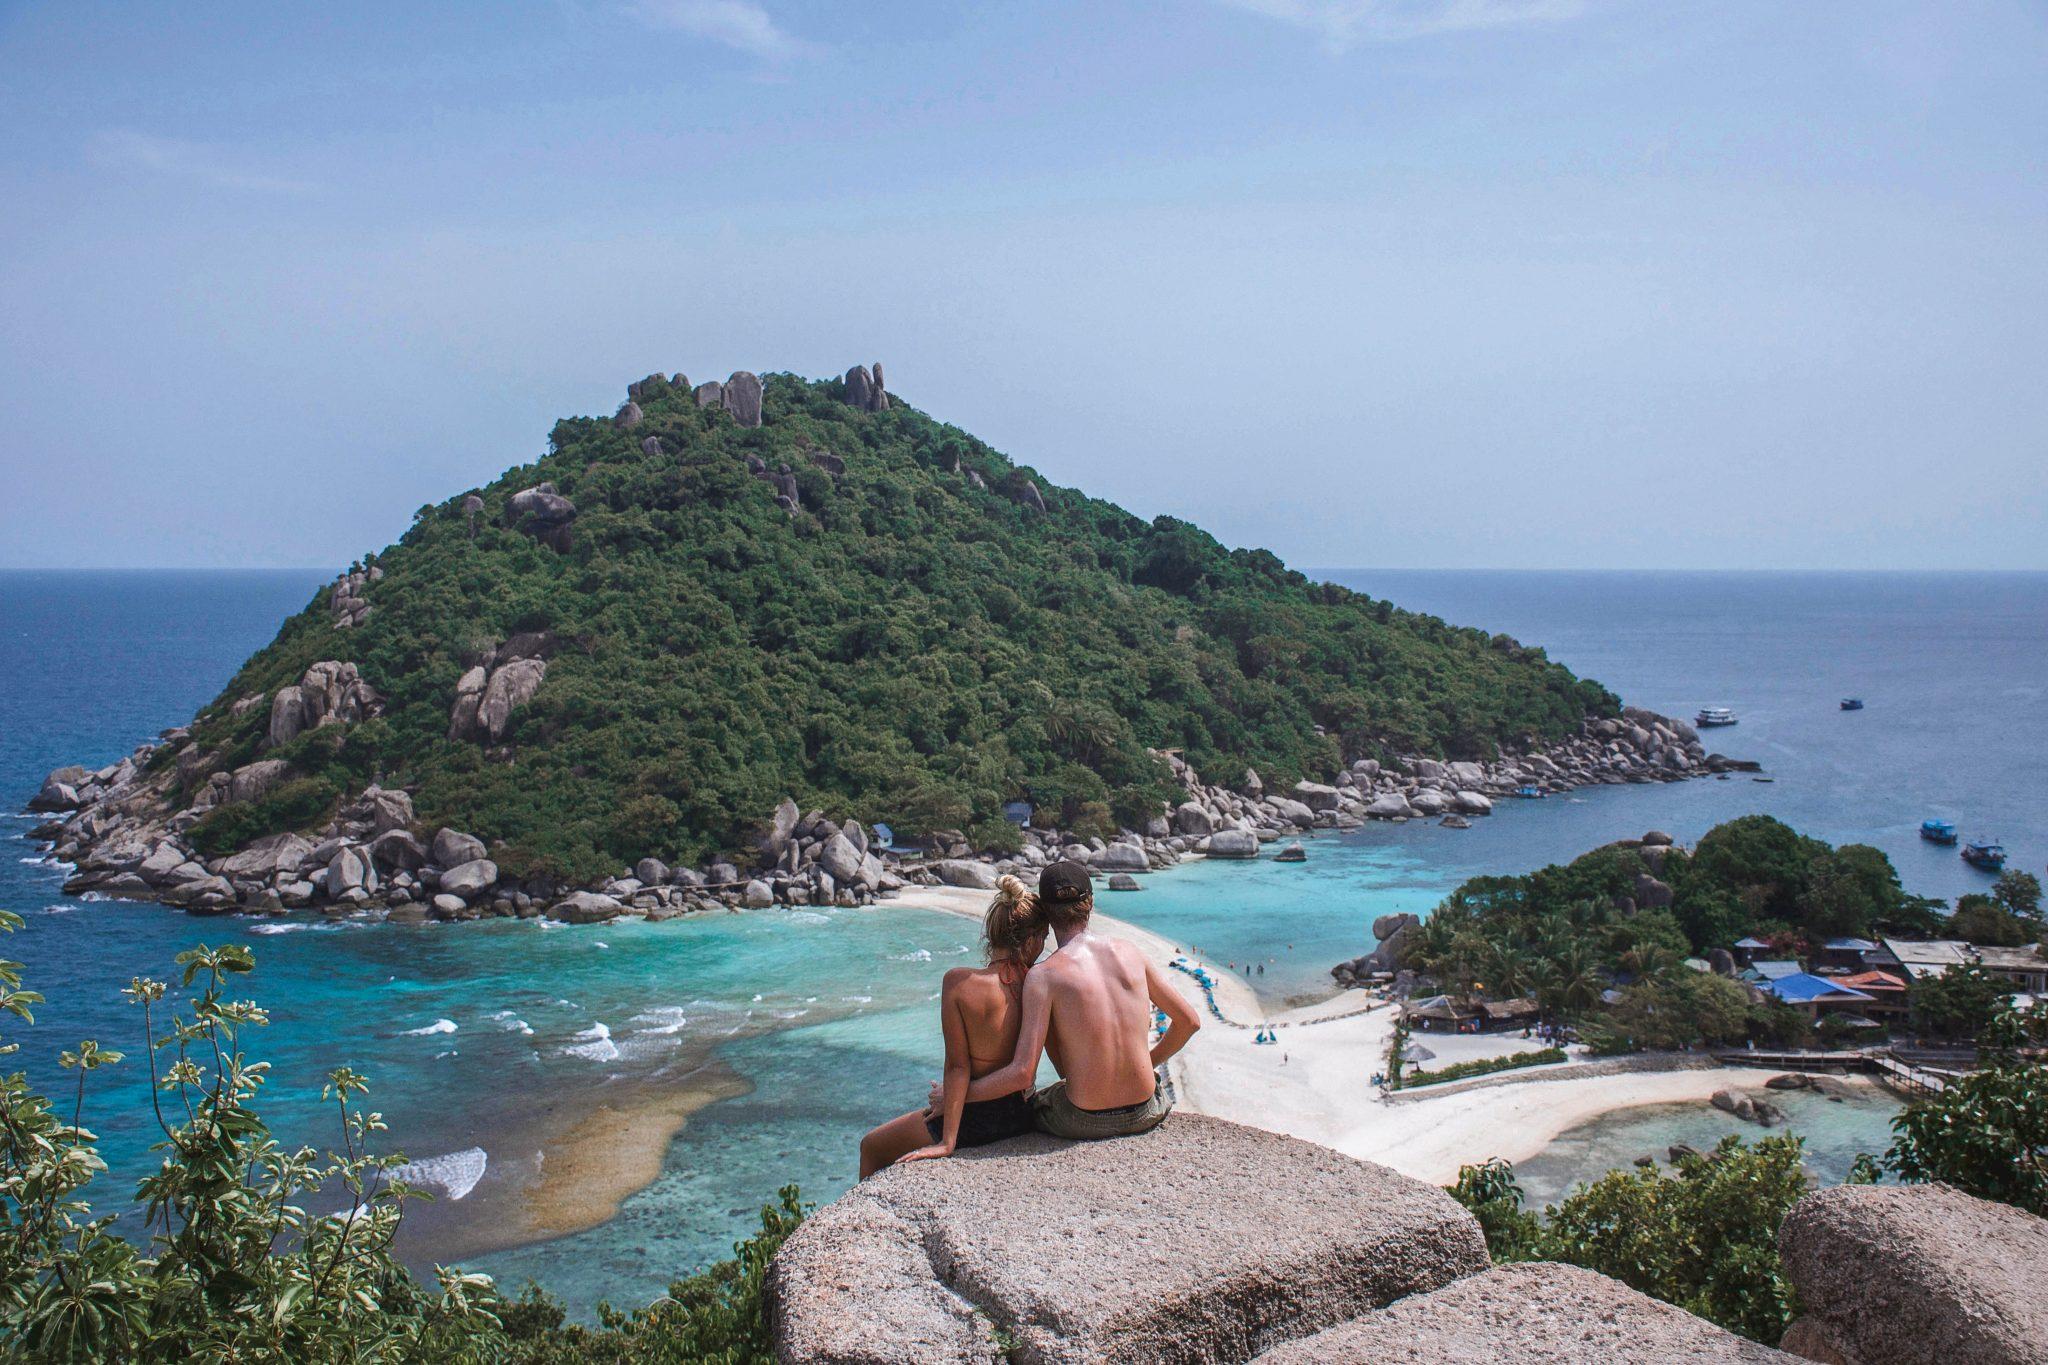 Wanderers & Warriors - Charlie & Lauren UK Travel Couple - Koh Nang Yuan Island - Koh Nang Yuan Koh Tao Viewpoints - Koh Nang Yuan Viewpoint - Koh Nangyuan things to do on koh tao